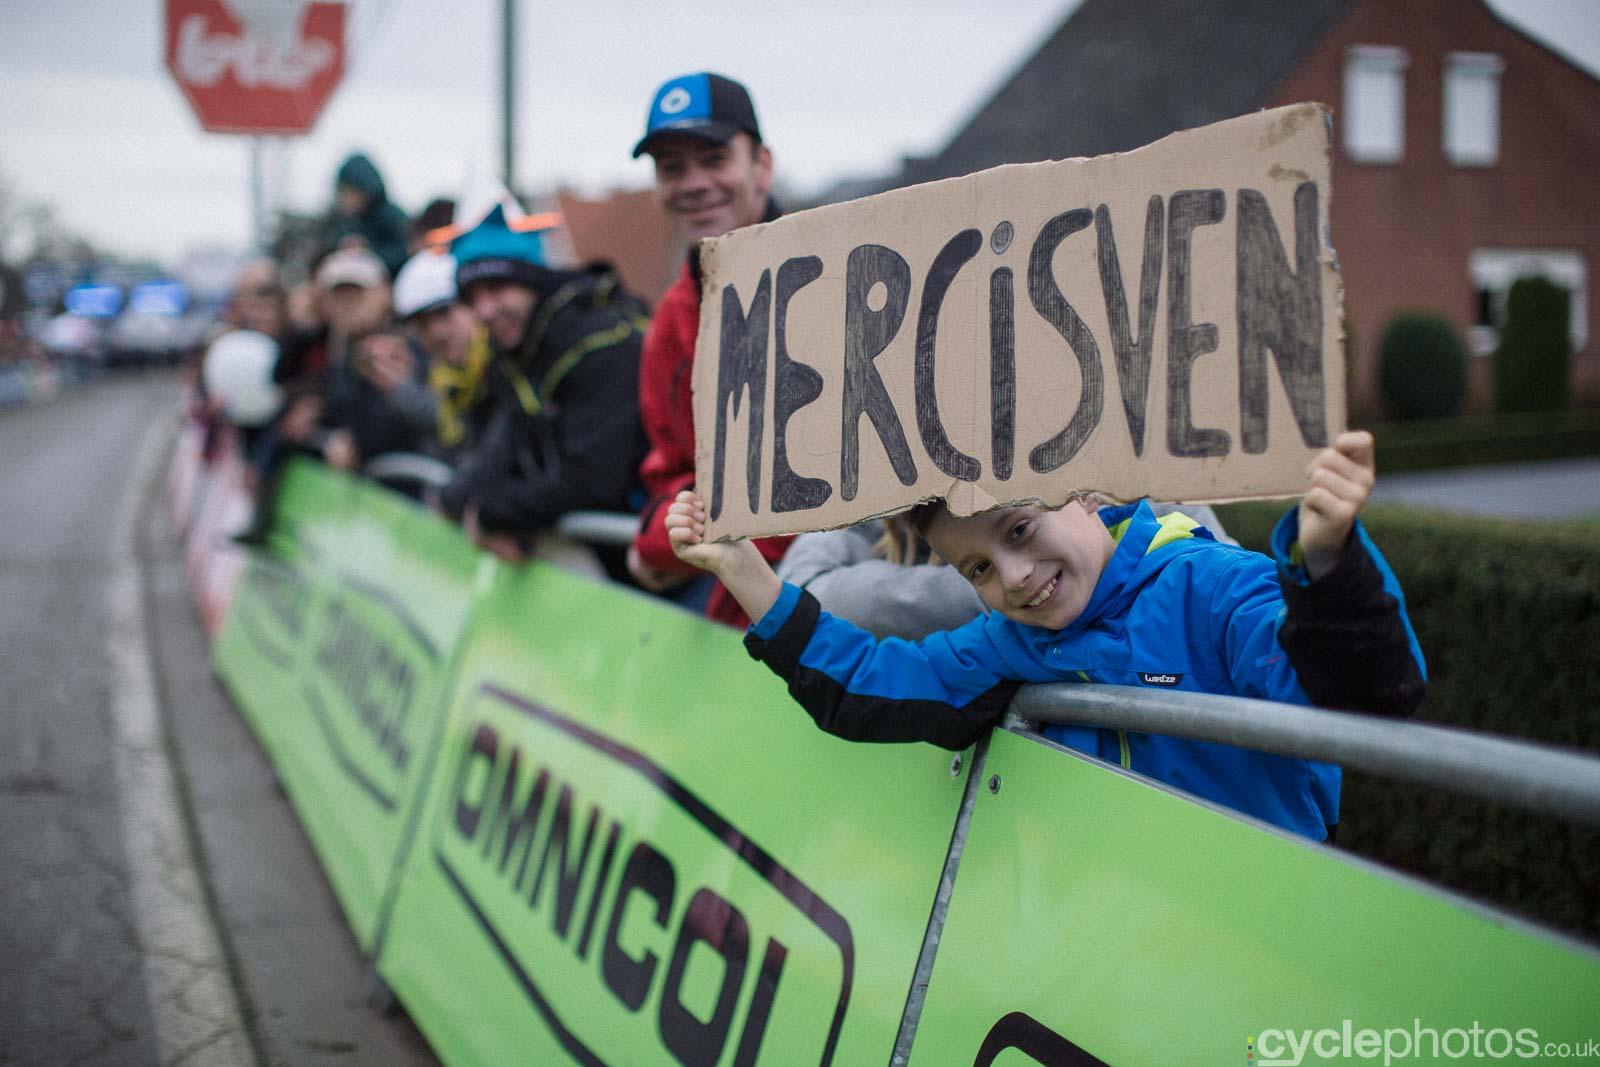 2016-cyclephotos-cyclocross-gpsvennys-145709-merci-sven